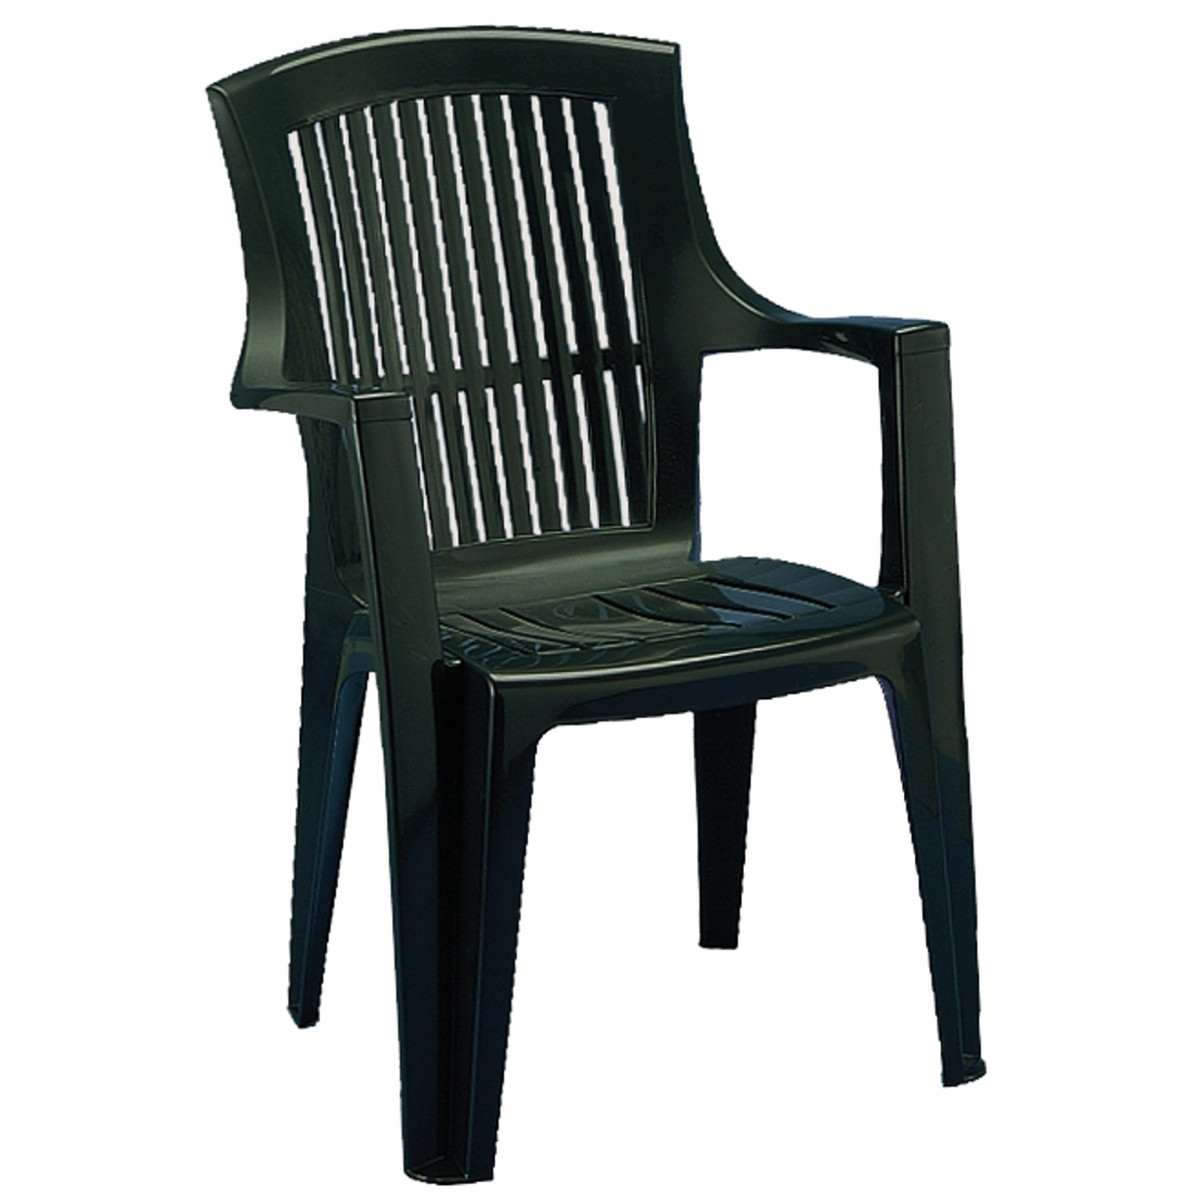 Arredo giardino: poltrone da esterno e sedie da giardino